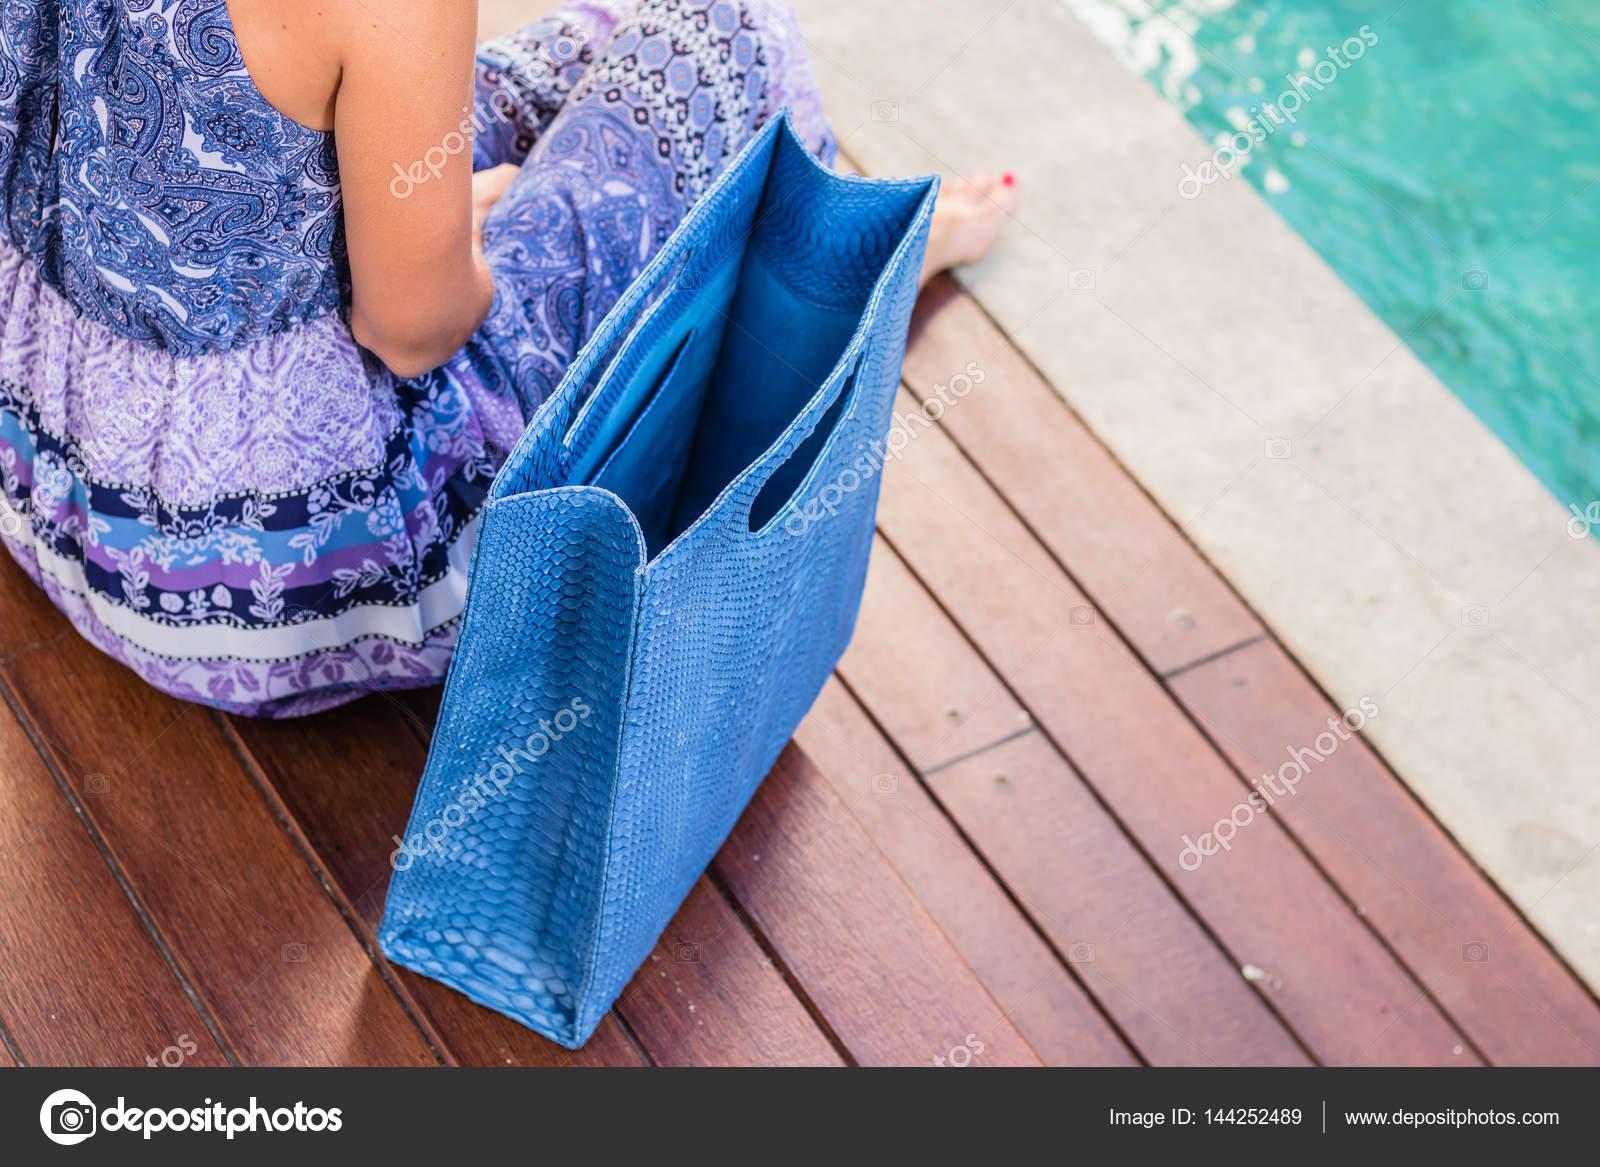 1a98de91c0 Μοντέρνα όμορφα μεγάλα μπλε δέρματος φιδιού python τσάντα κοντά το κορίτσι  σε ένα μοντέρνο φόρεμα